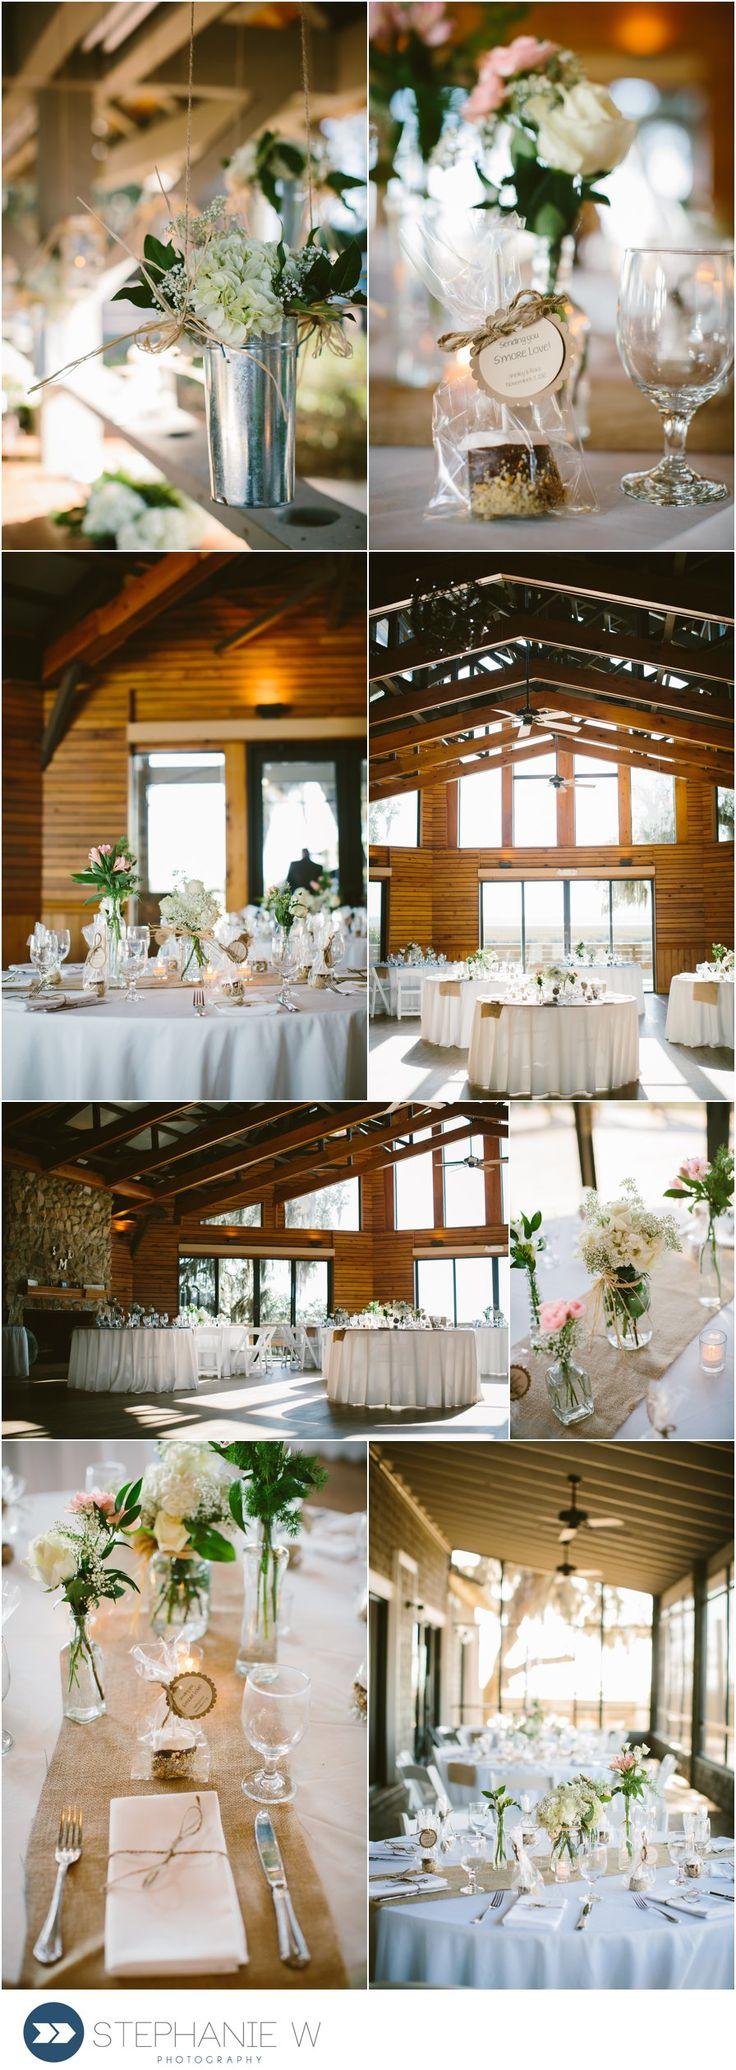 North beach plantation weddings   best Amelia Island Wedding images on Pinterest  Weddings Beach